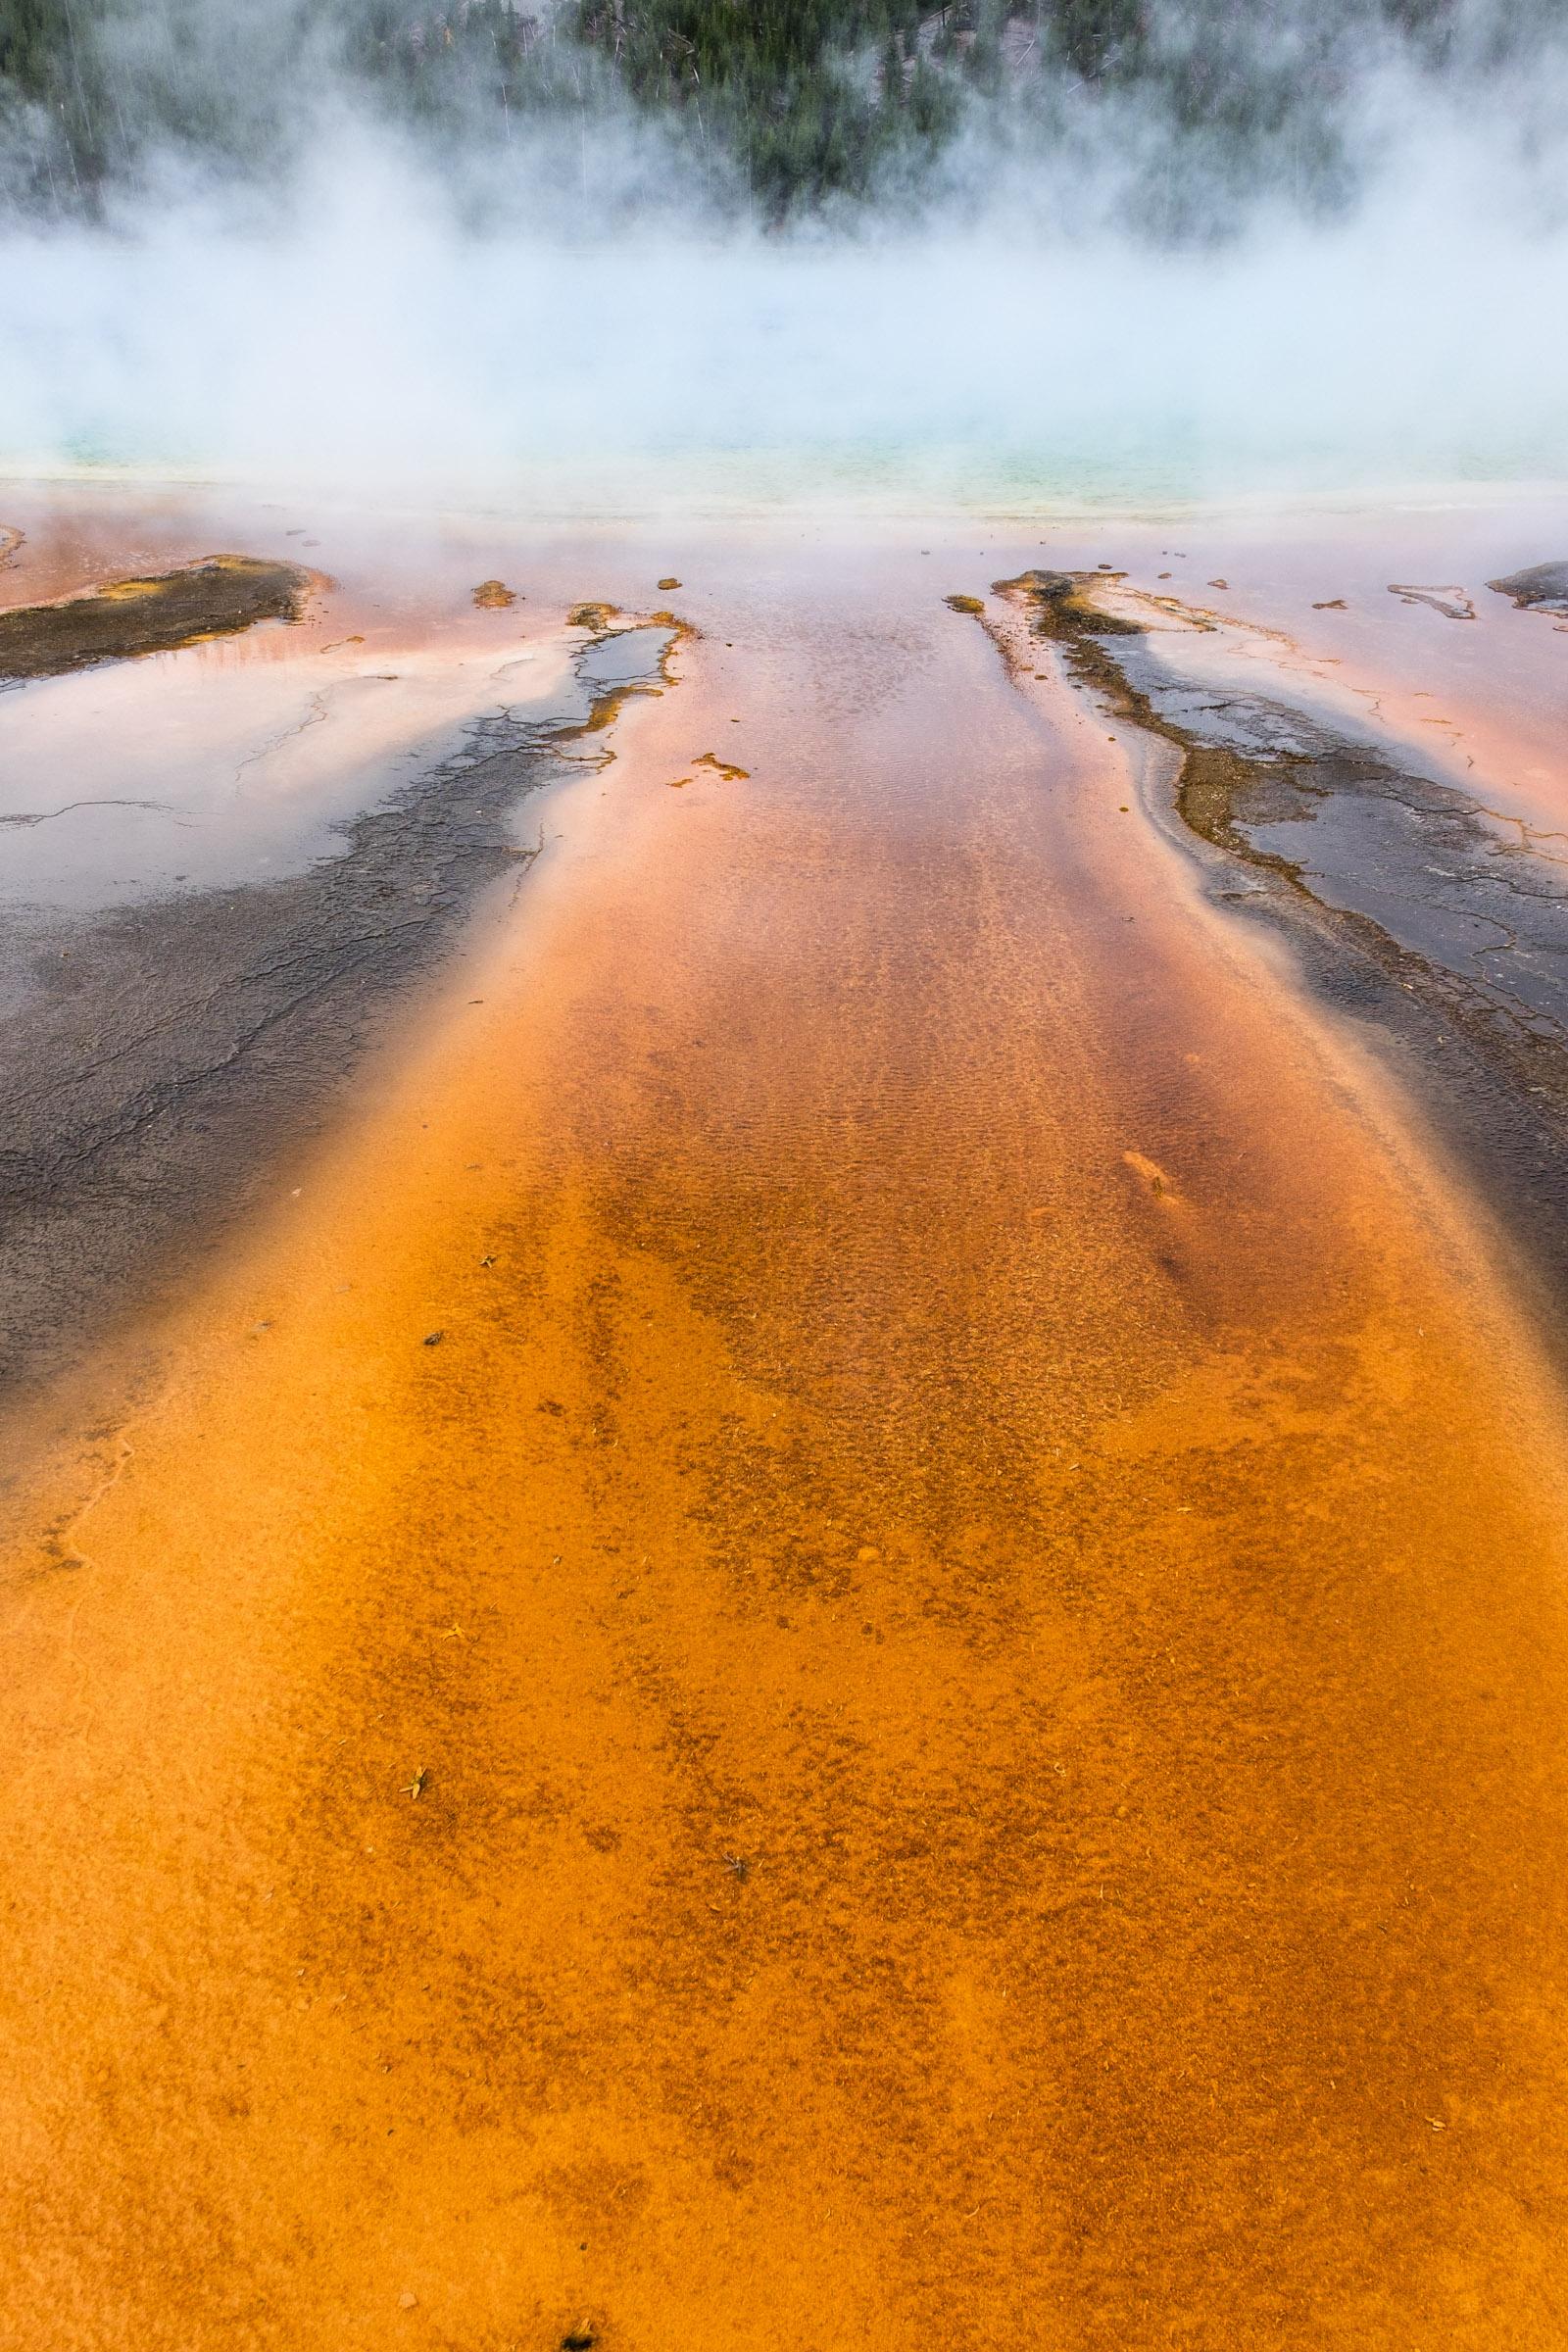 20160921-JI-Yellowstone National Park-_DSF1523.jpg